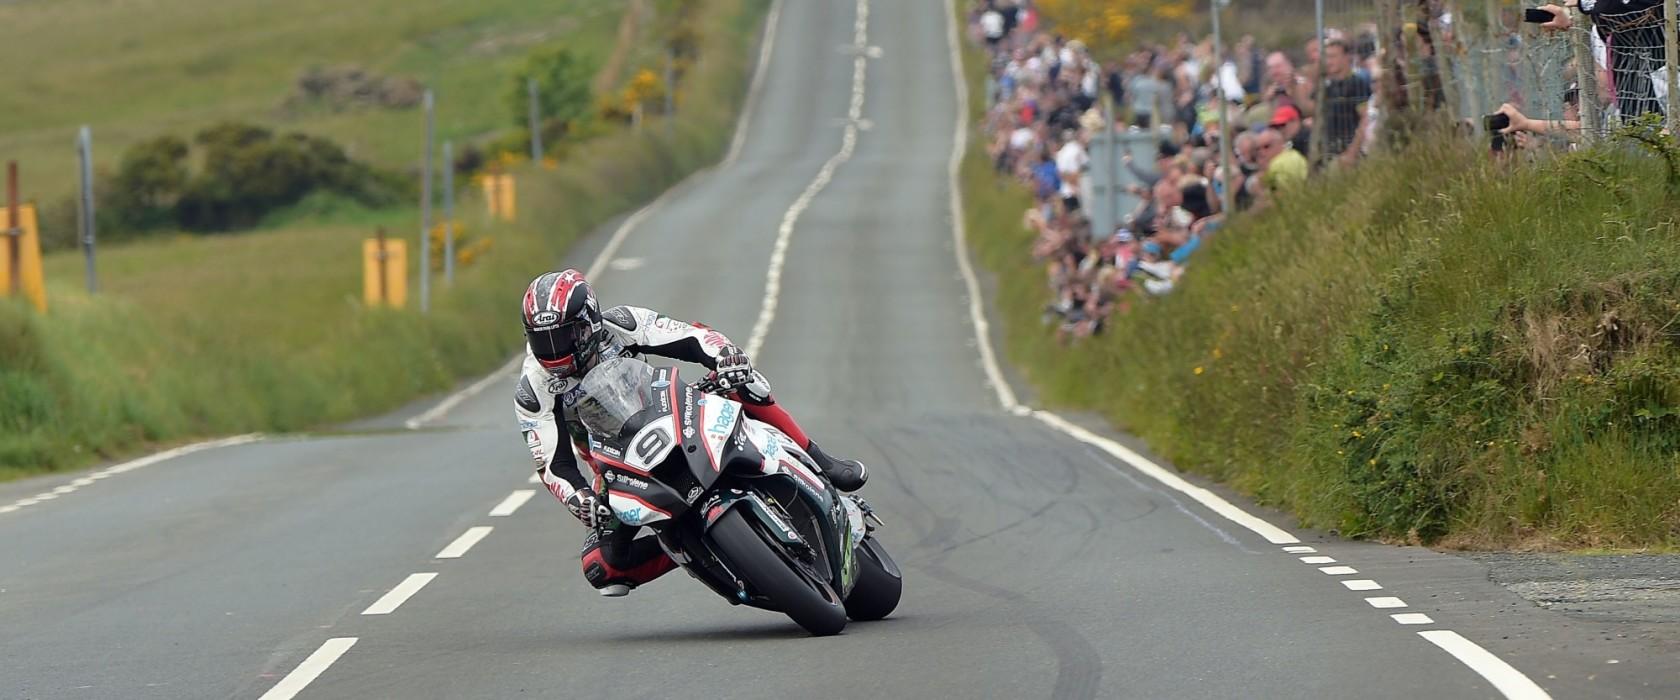 #9 Ian Hutchinson PBM Kawasaki